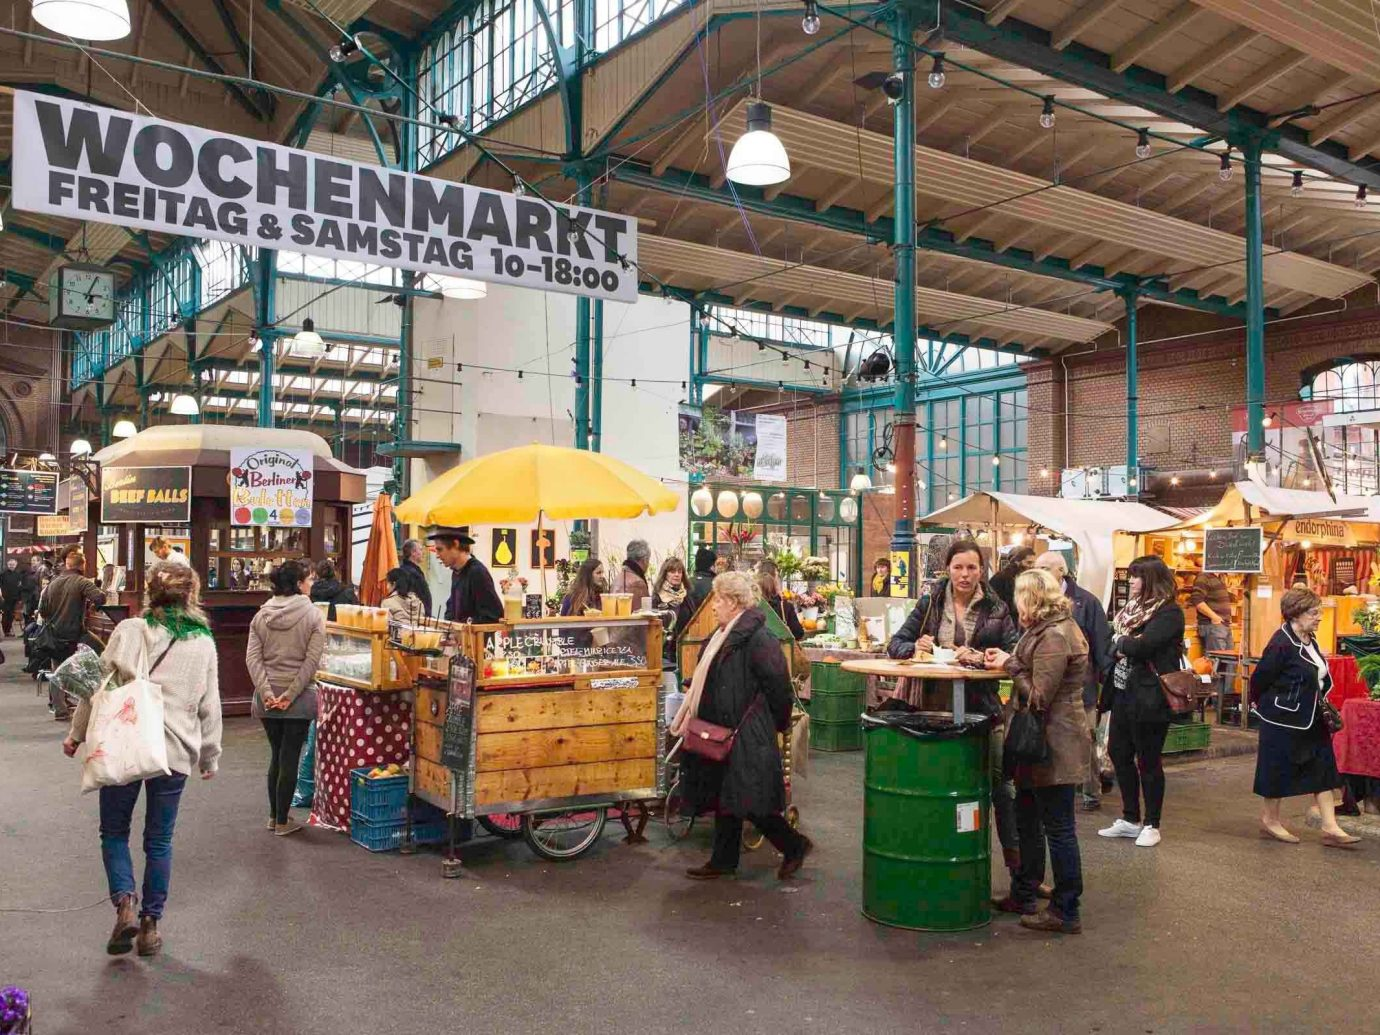 Trip Ideas building marketplace market City public space person outdoor people bazaar human settlement Town vendor road fair street stall